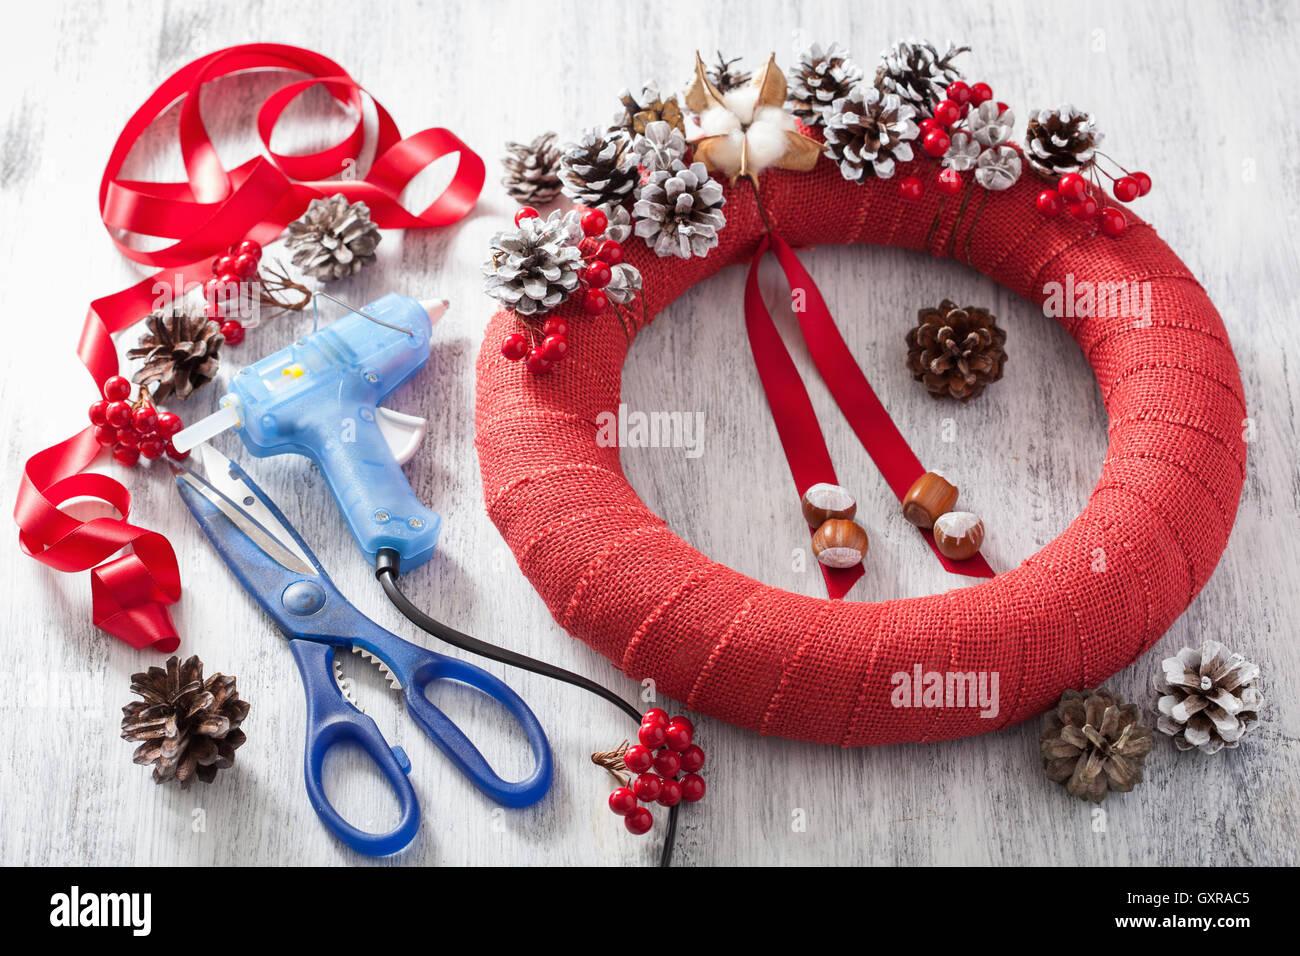 making red christmas wreath diy handmade - Stock Image